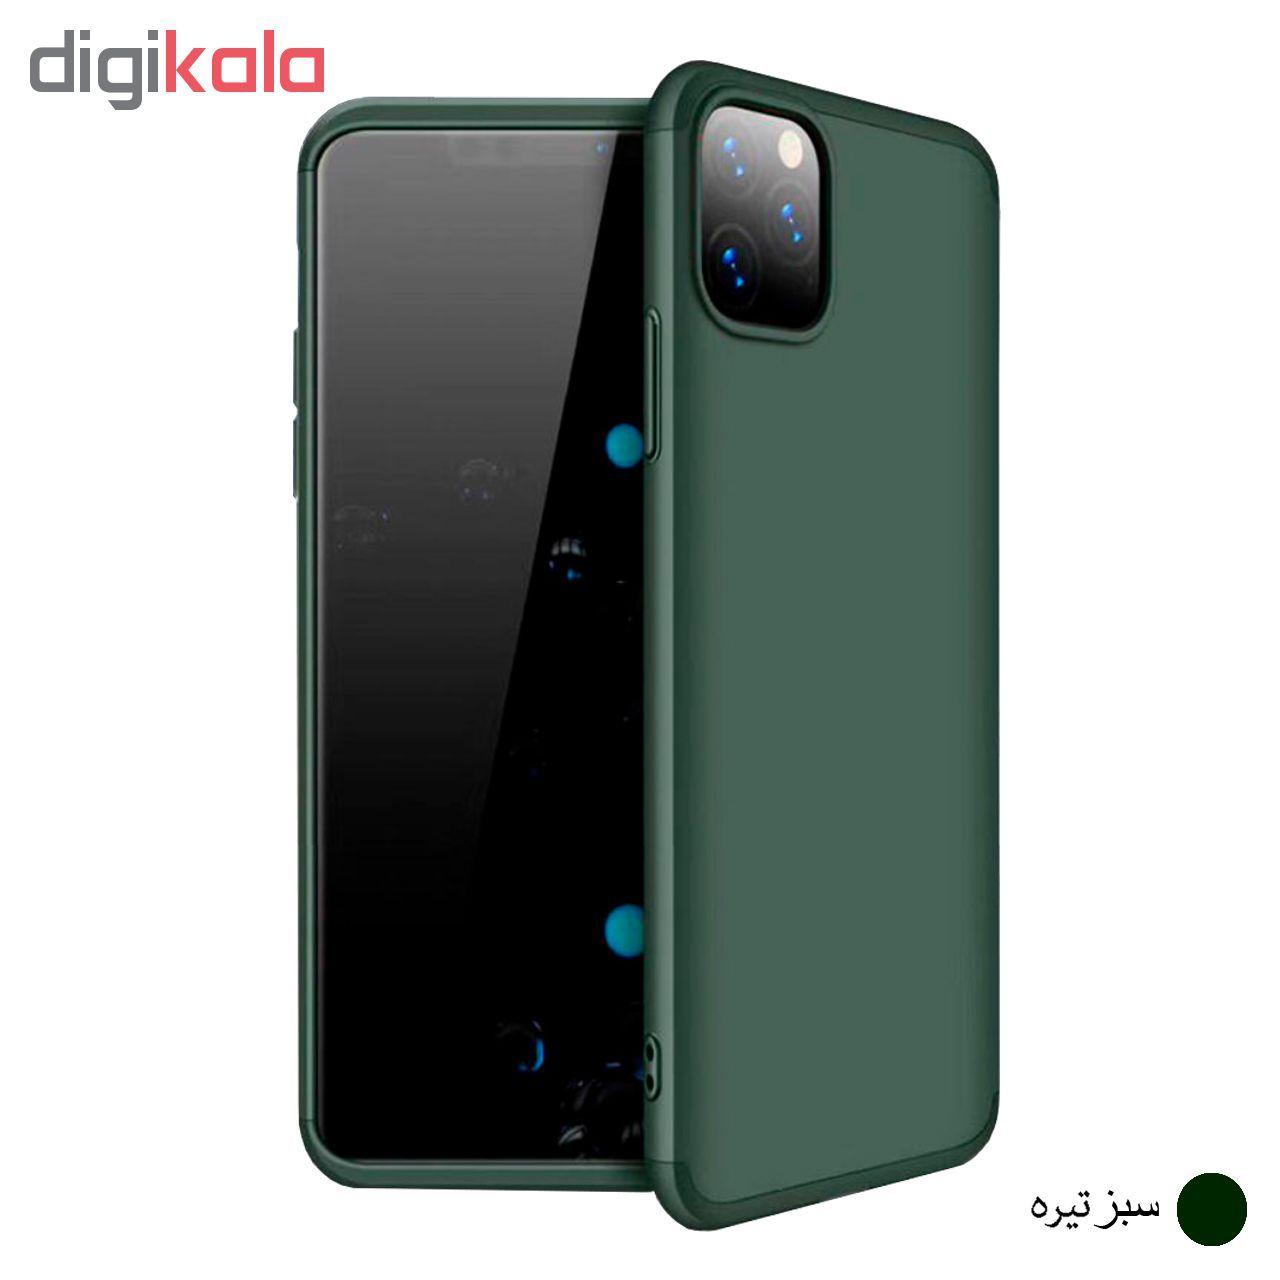 کاور 360 درجه جی کی کی مدل GK مناسب برای گوشی موبایل اپل IPhone 11 Pro Max main 1 3